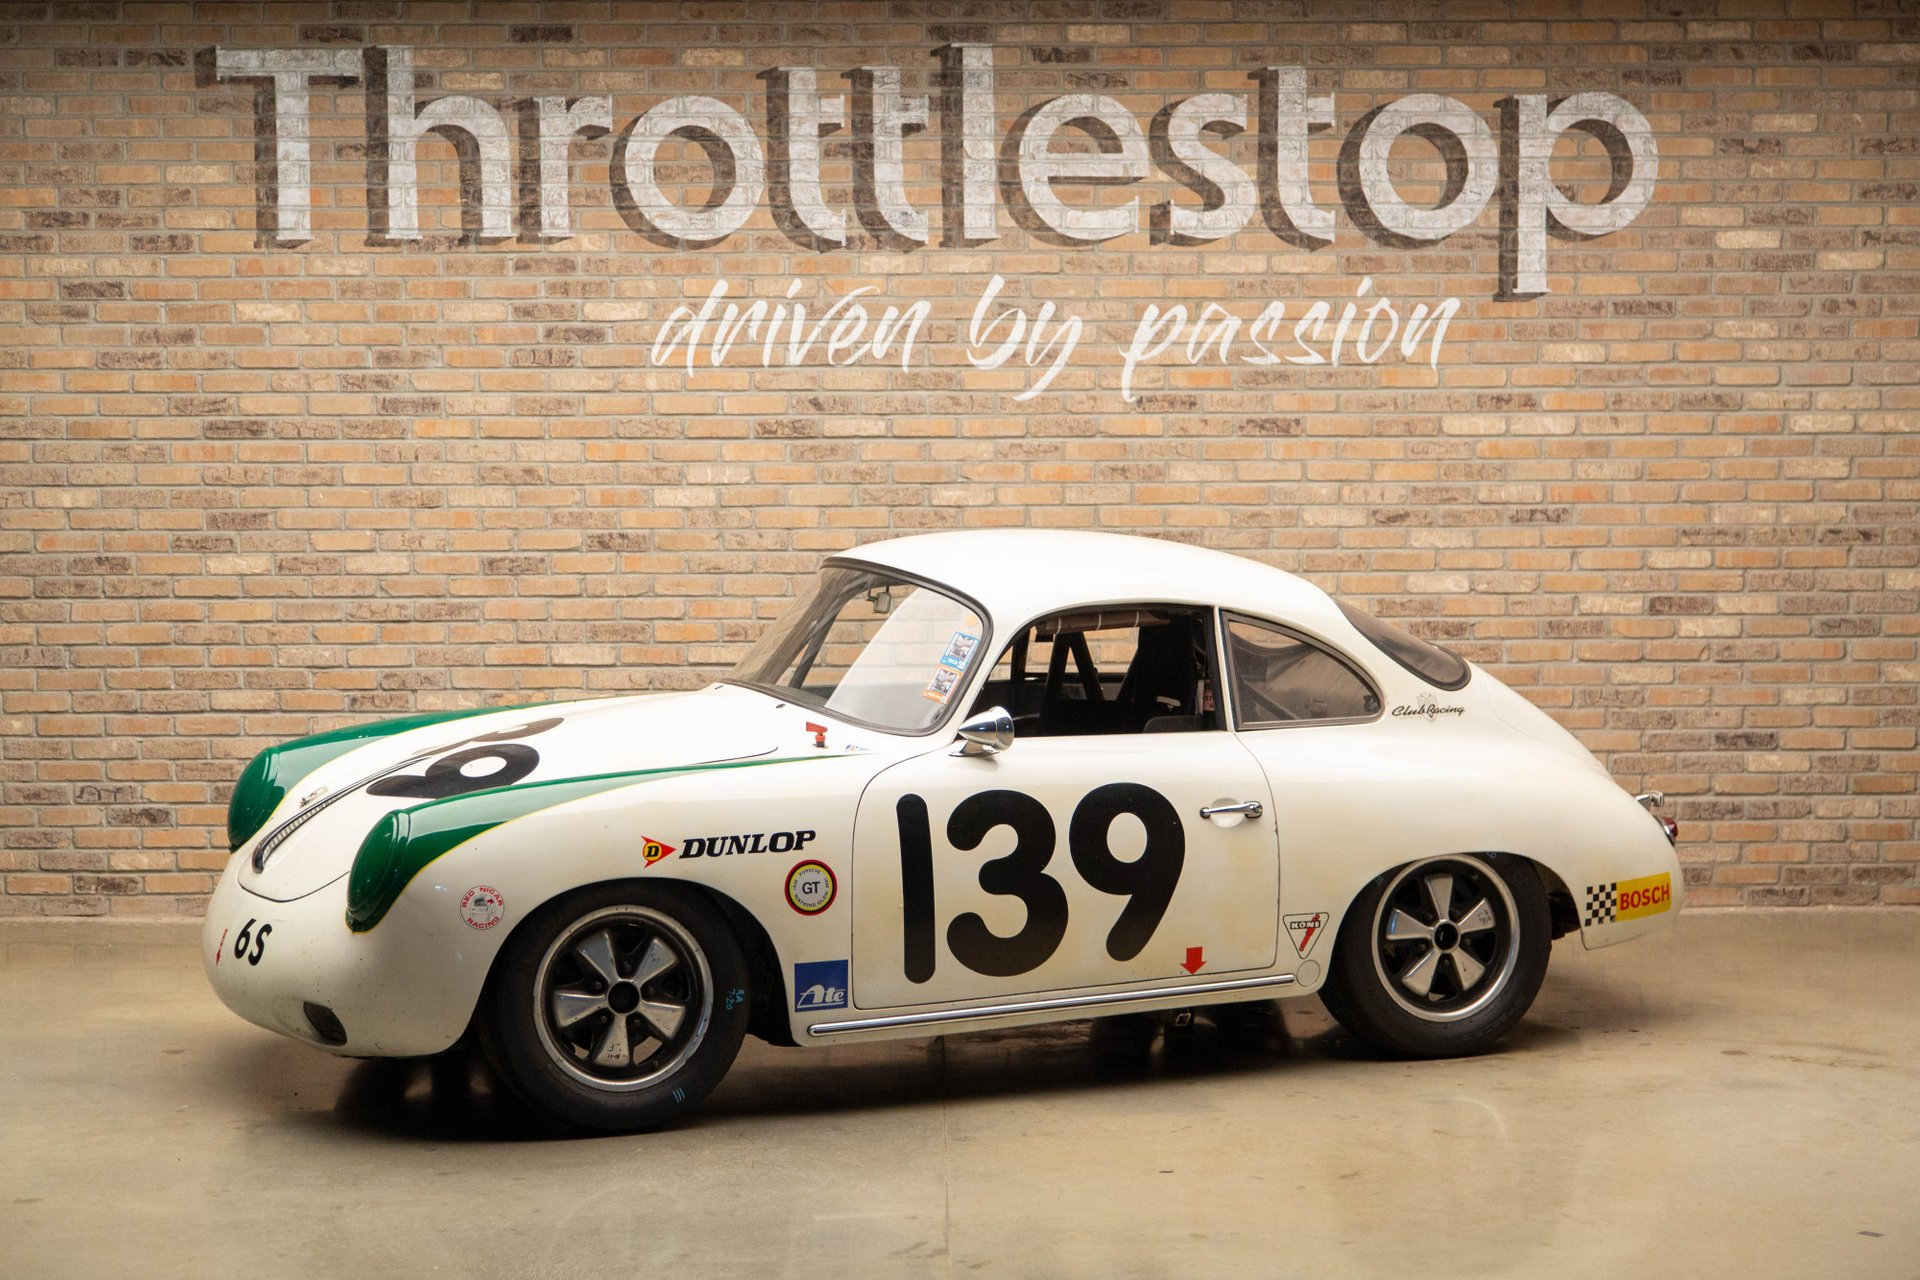 1964 porsche 356 c vintage racer